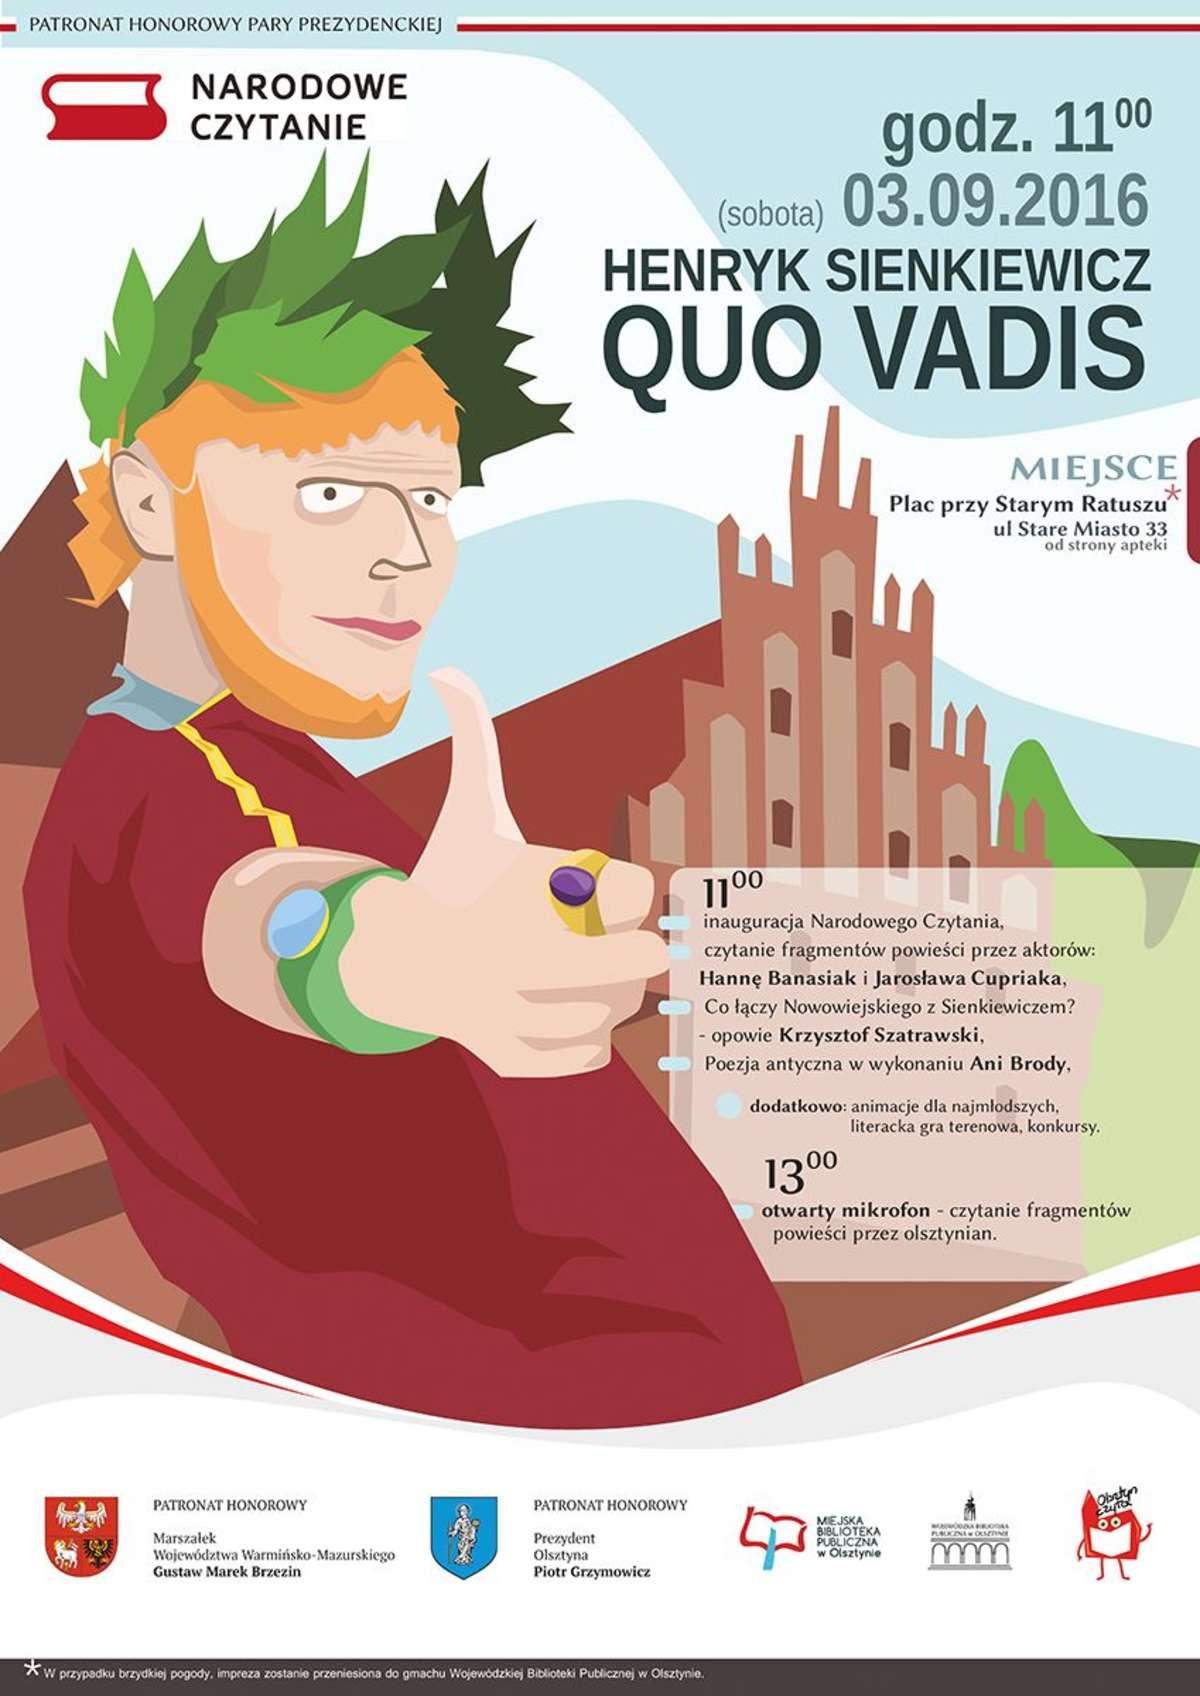 "Narodowe Czytanie ""Quo vadis"" - full image"